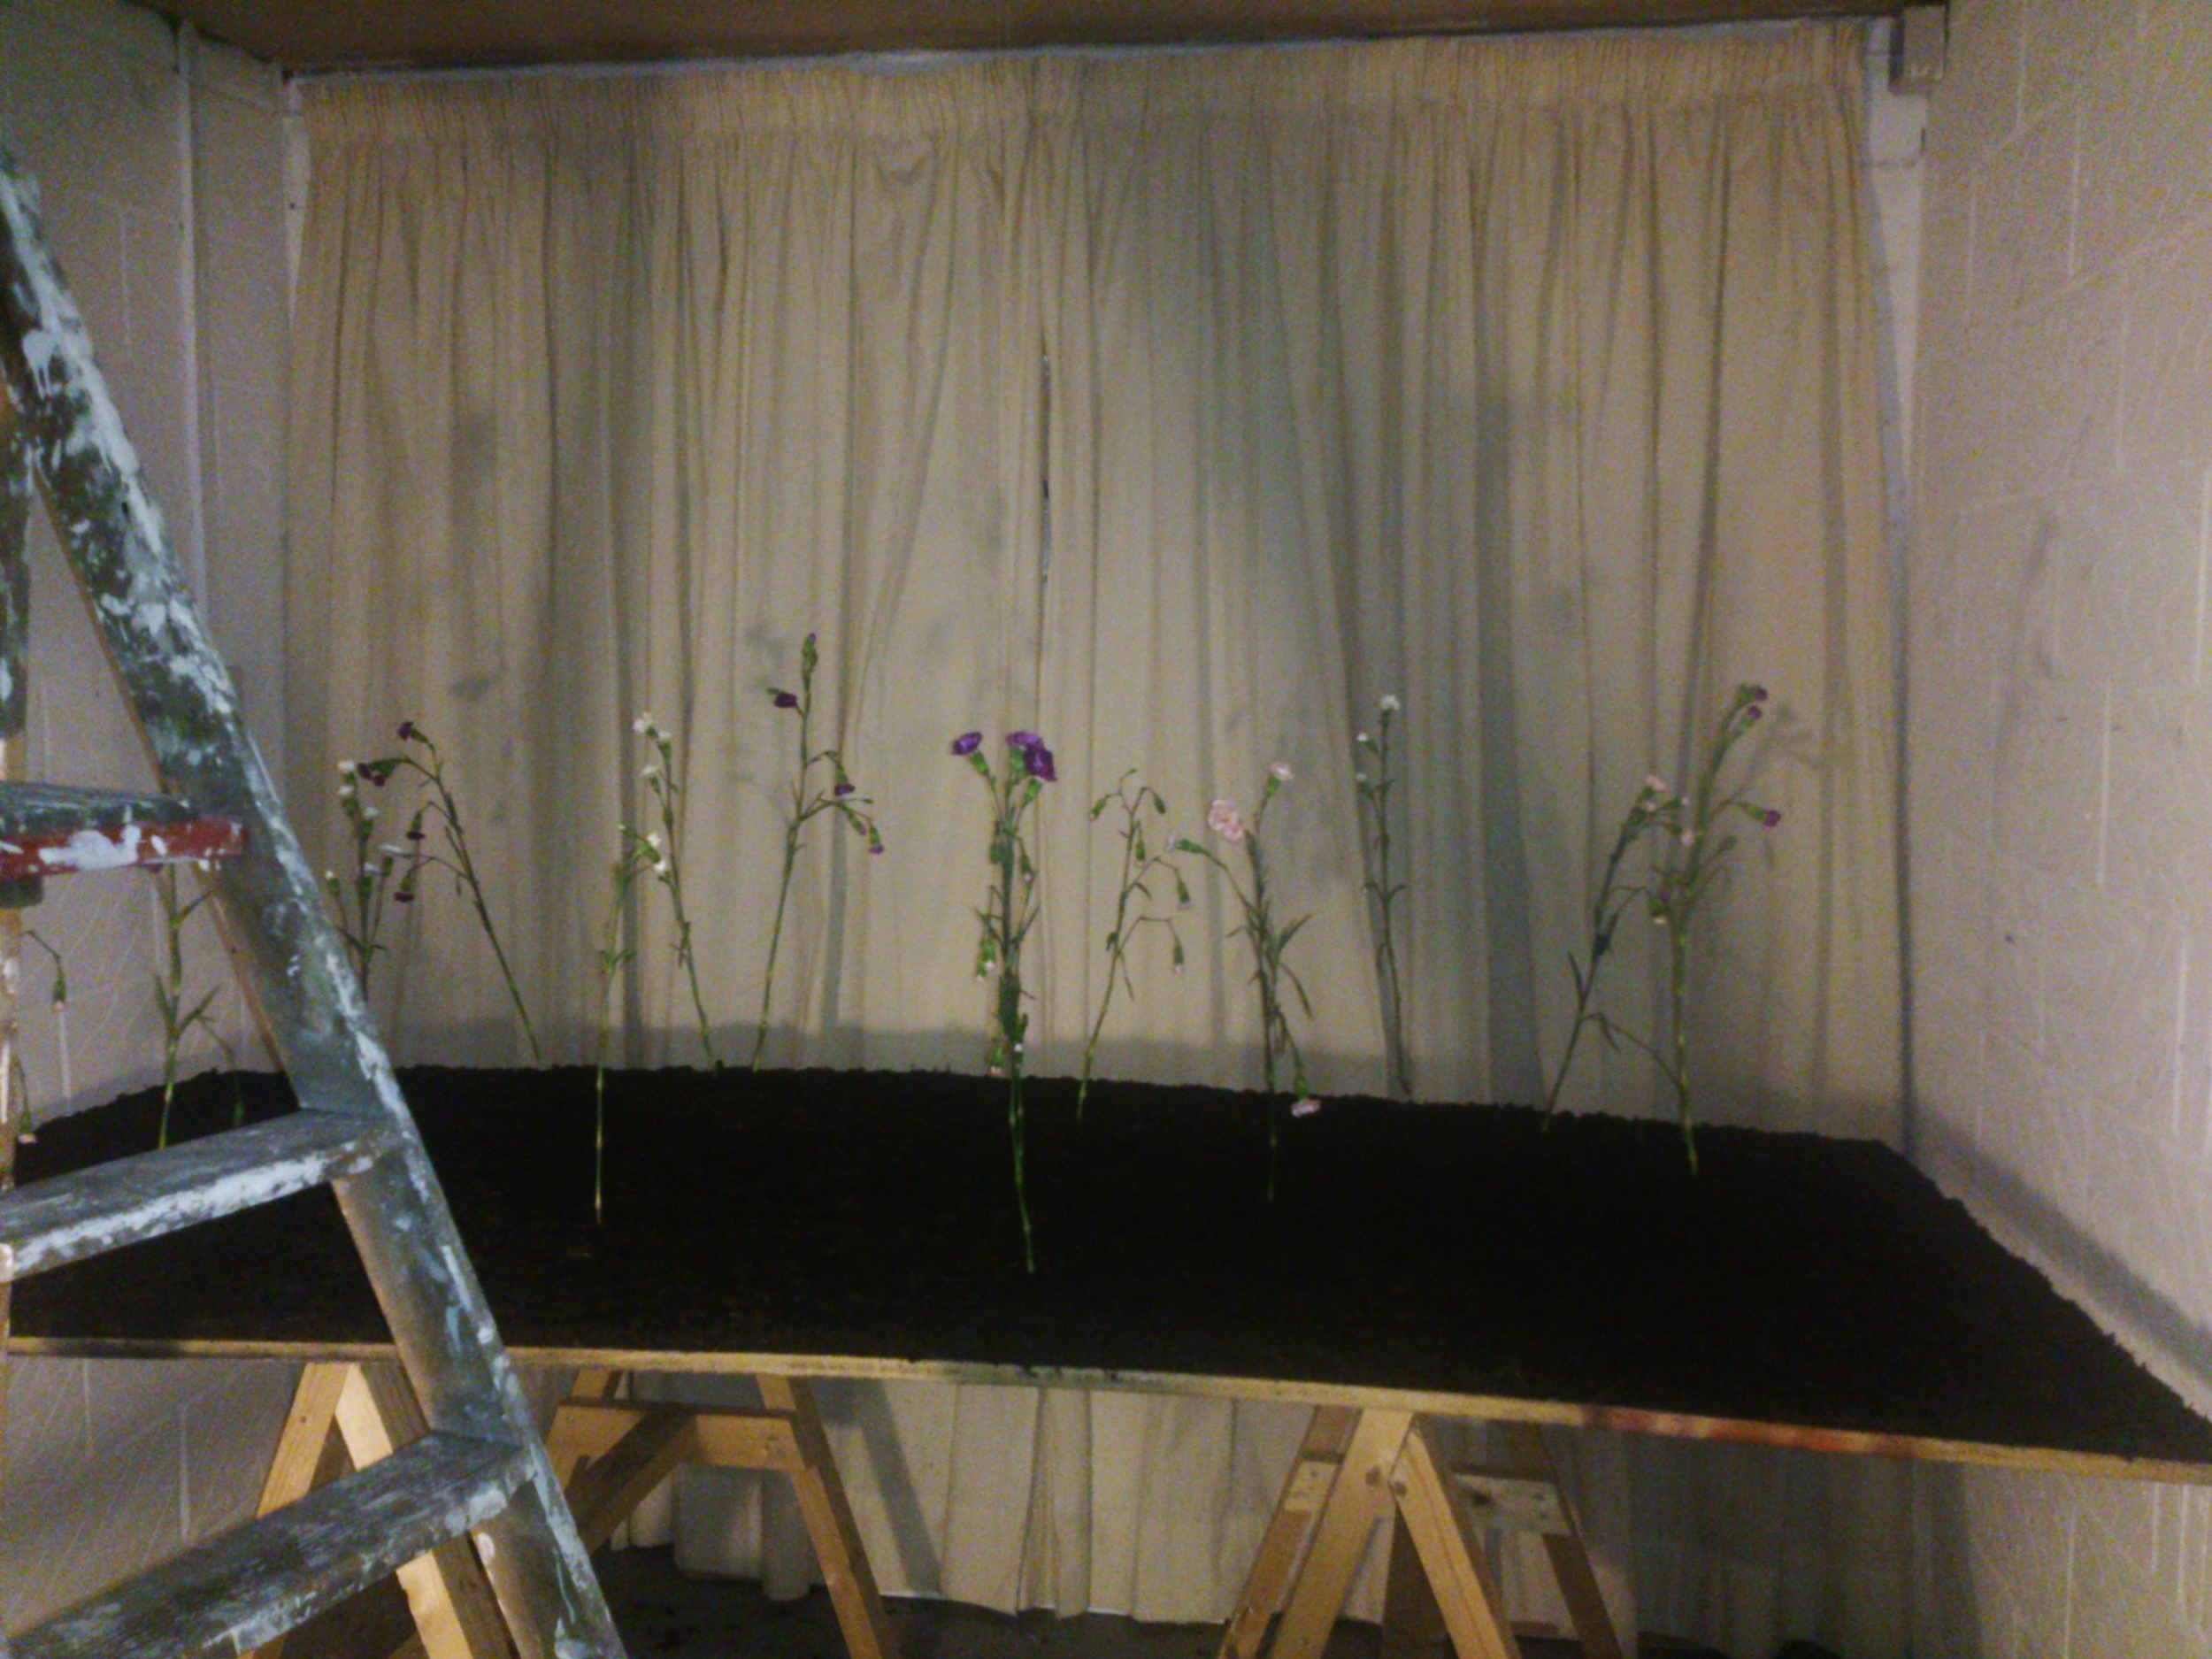 Studio space of artist in residence Mair Cook